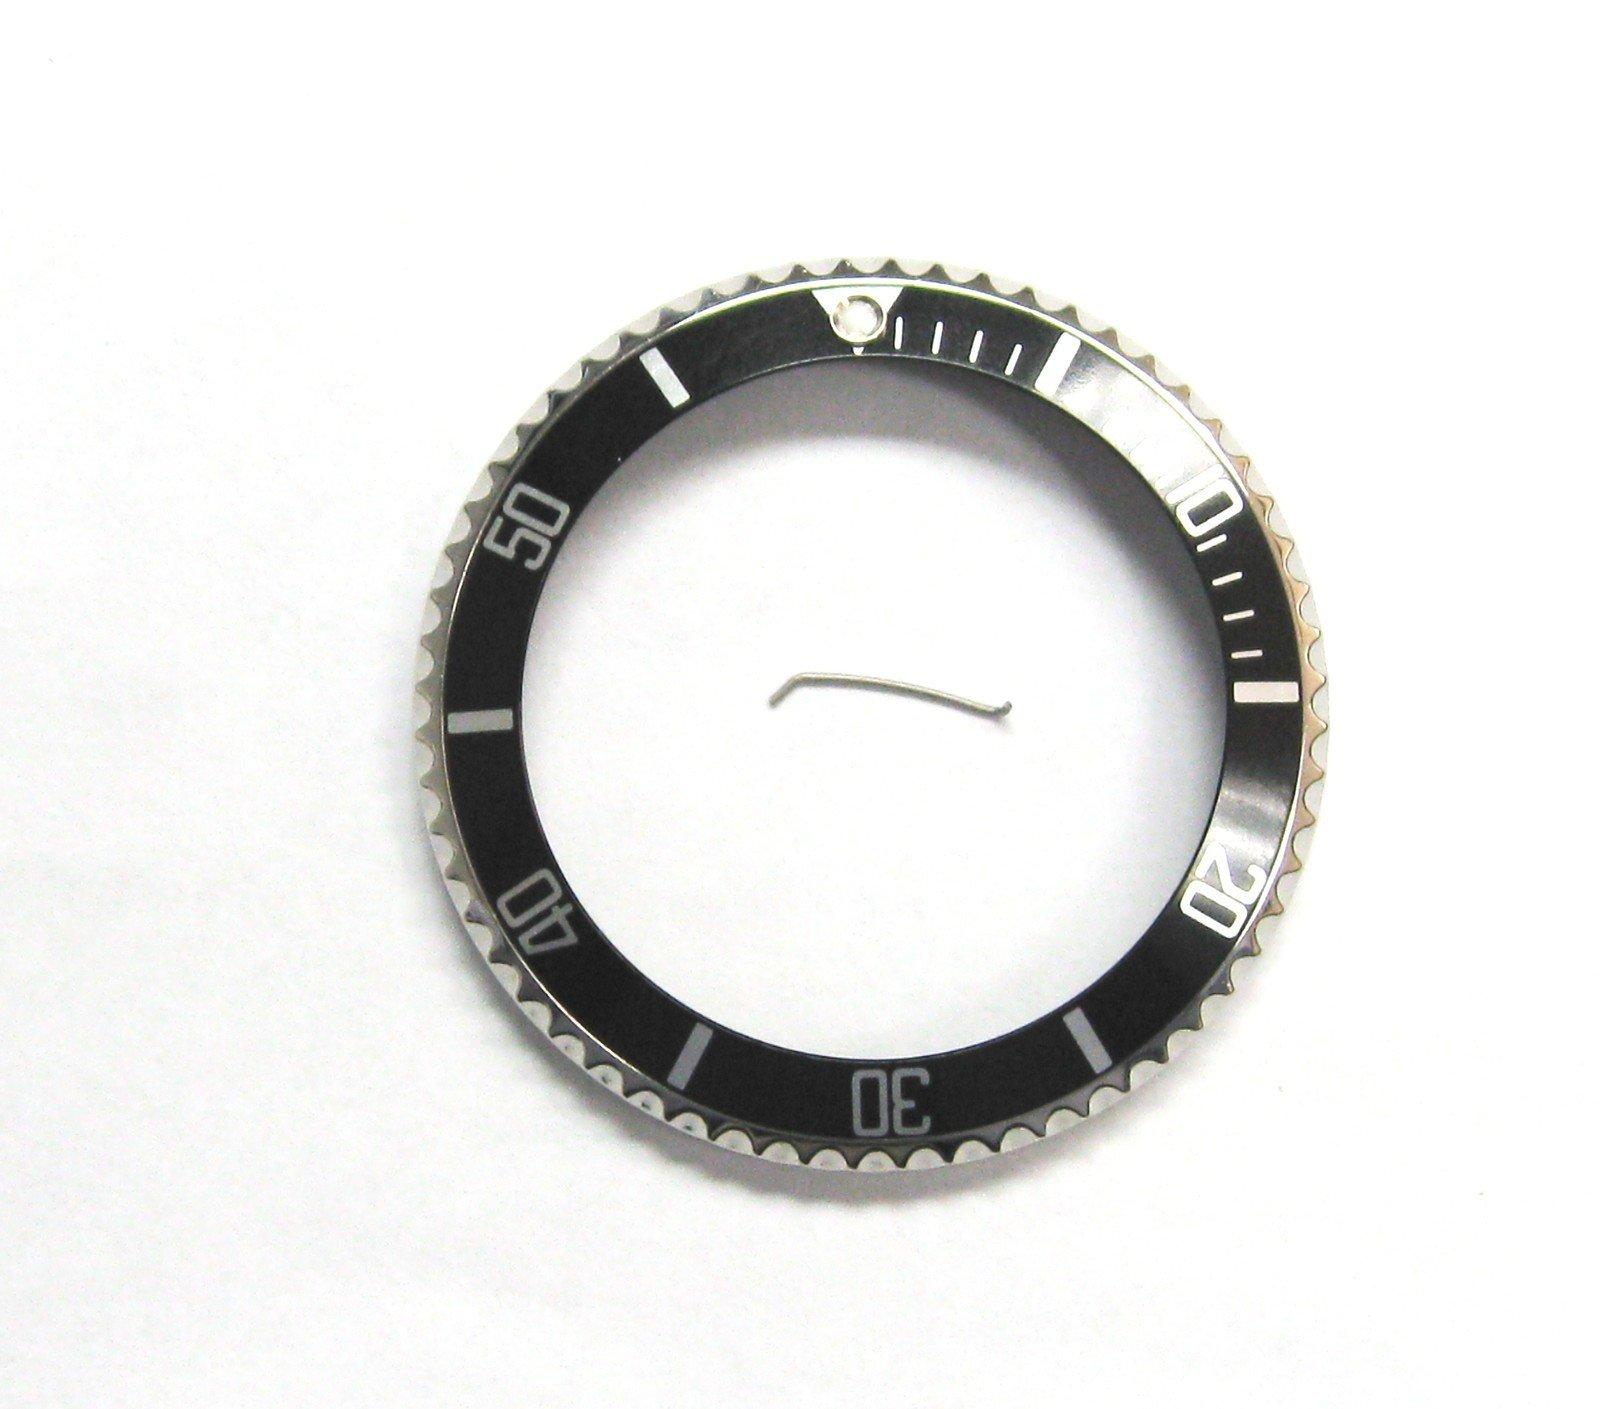 Bezel+Insert for Rolex Submariner Seadweller 16660, 16600 Bk